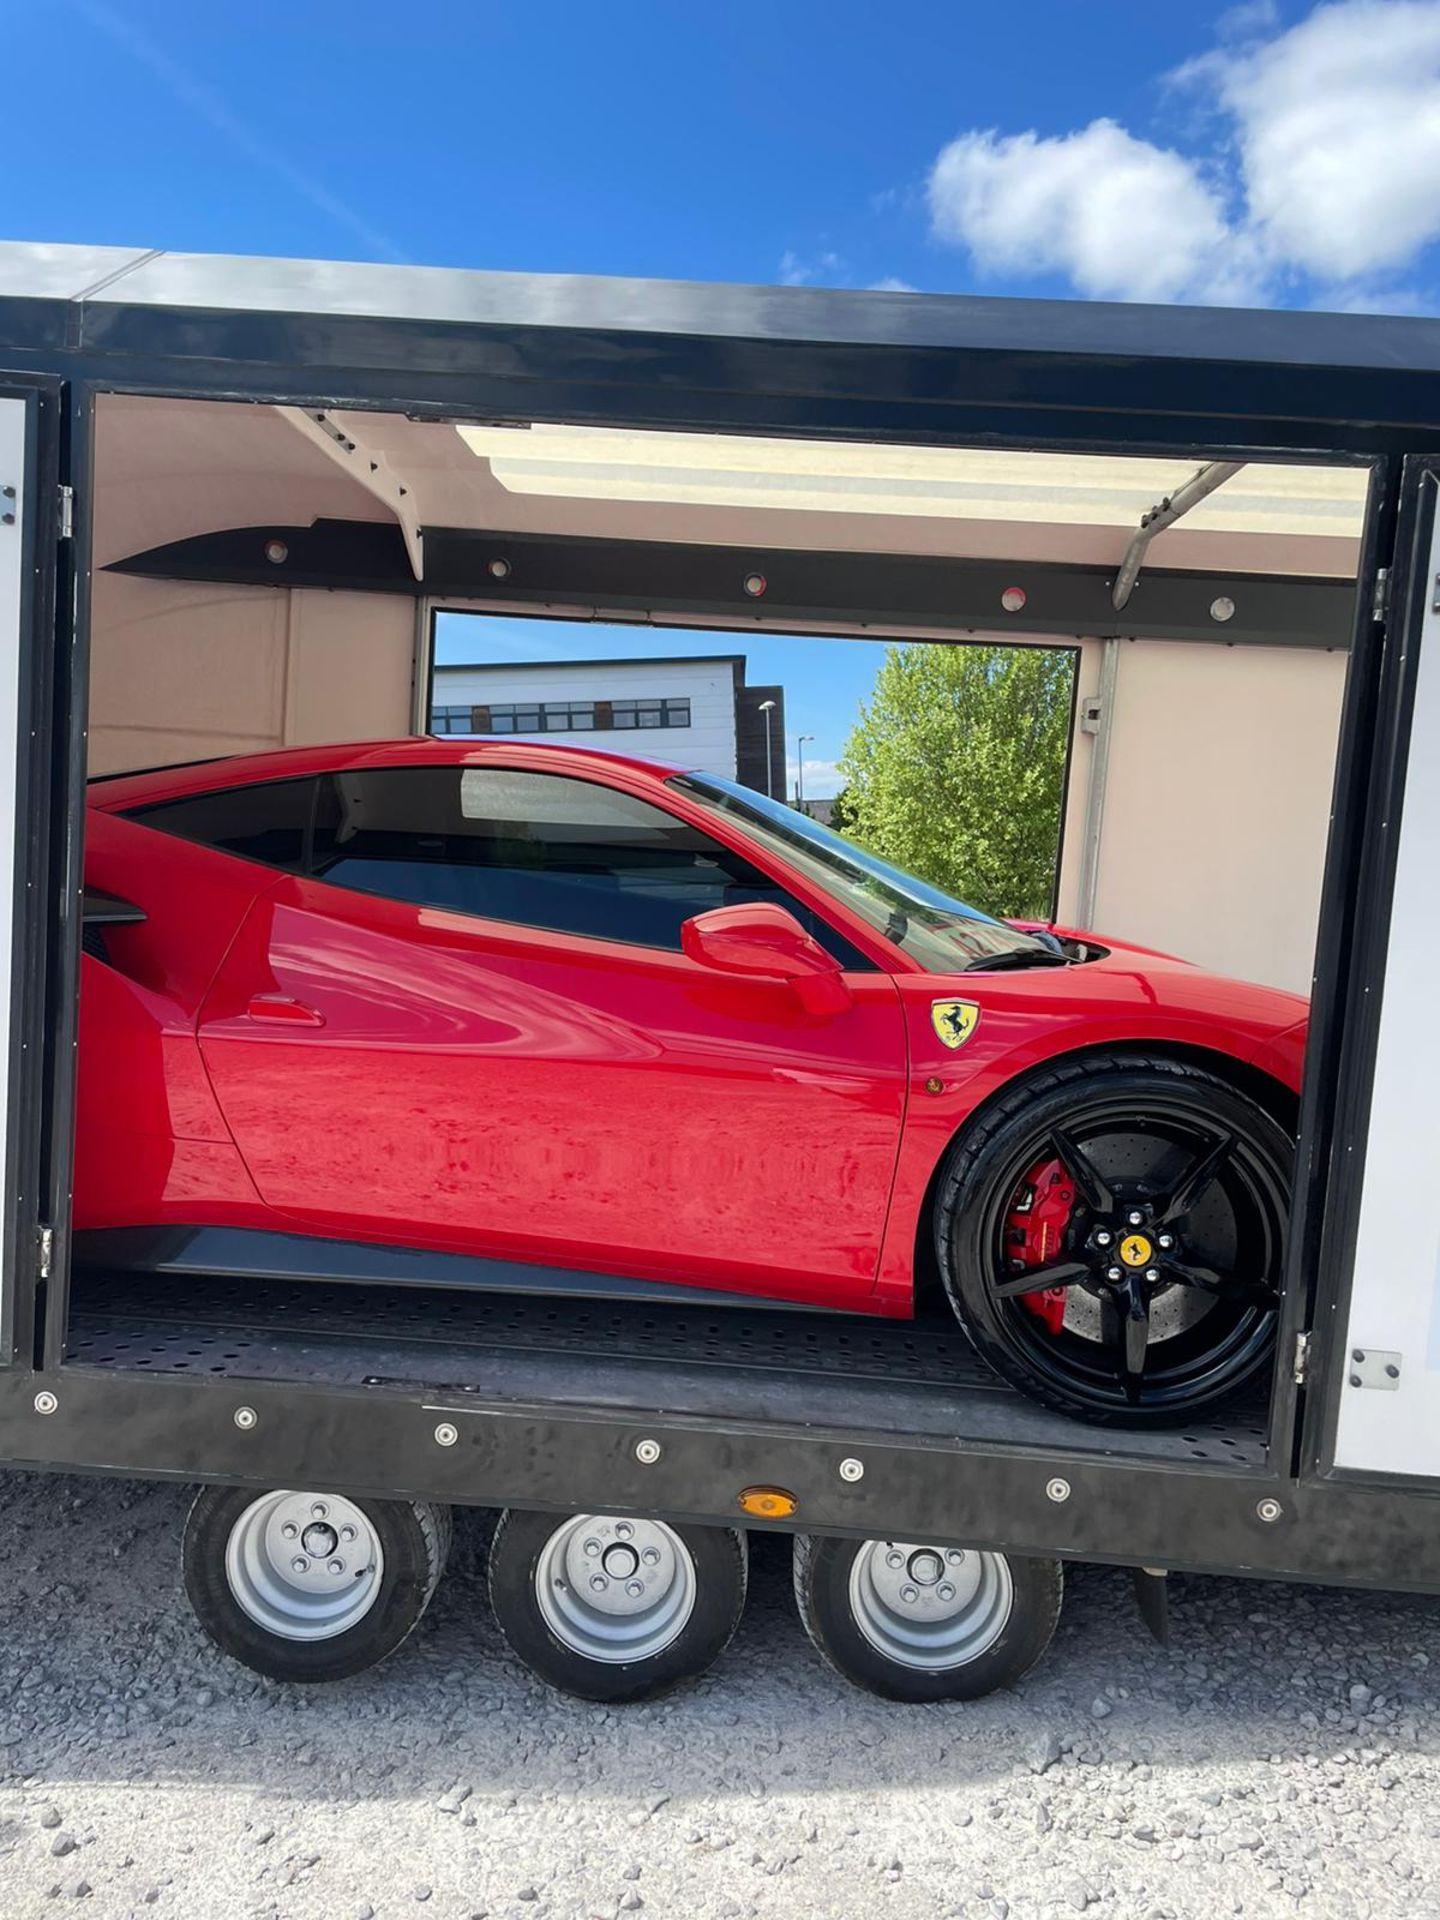 2016 FERRARI 488 GTB 2DR RED COUPE, PETROL, AUTOMATIC, 11K MILES, LEFT HAND DRIVE *NO VAT* - Image 7 of 22